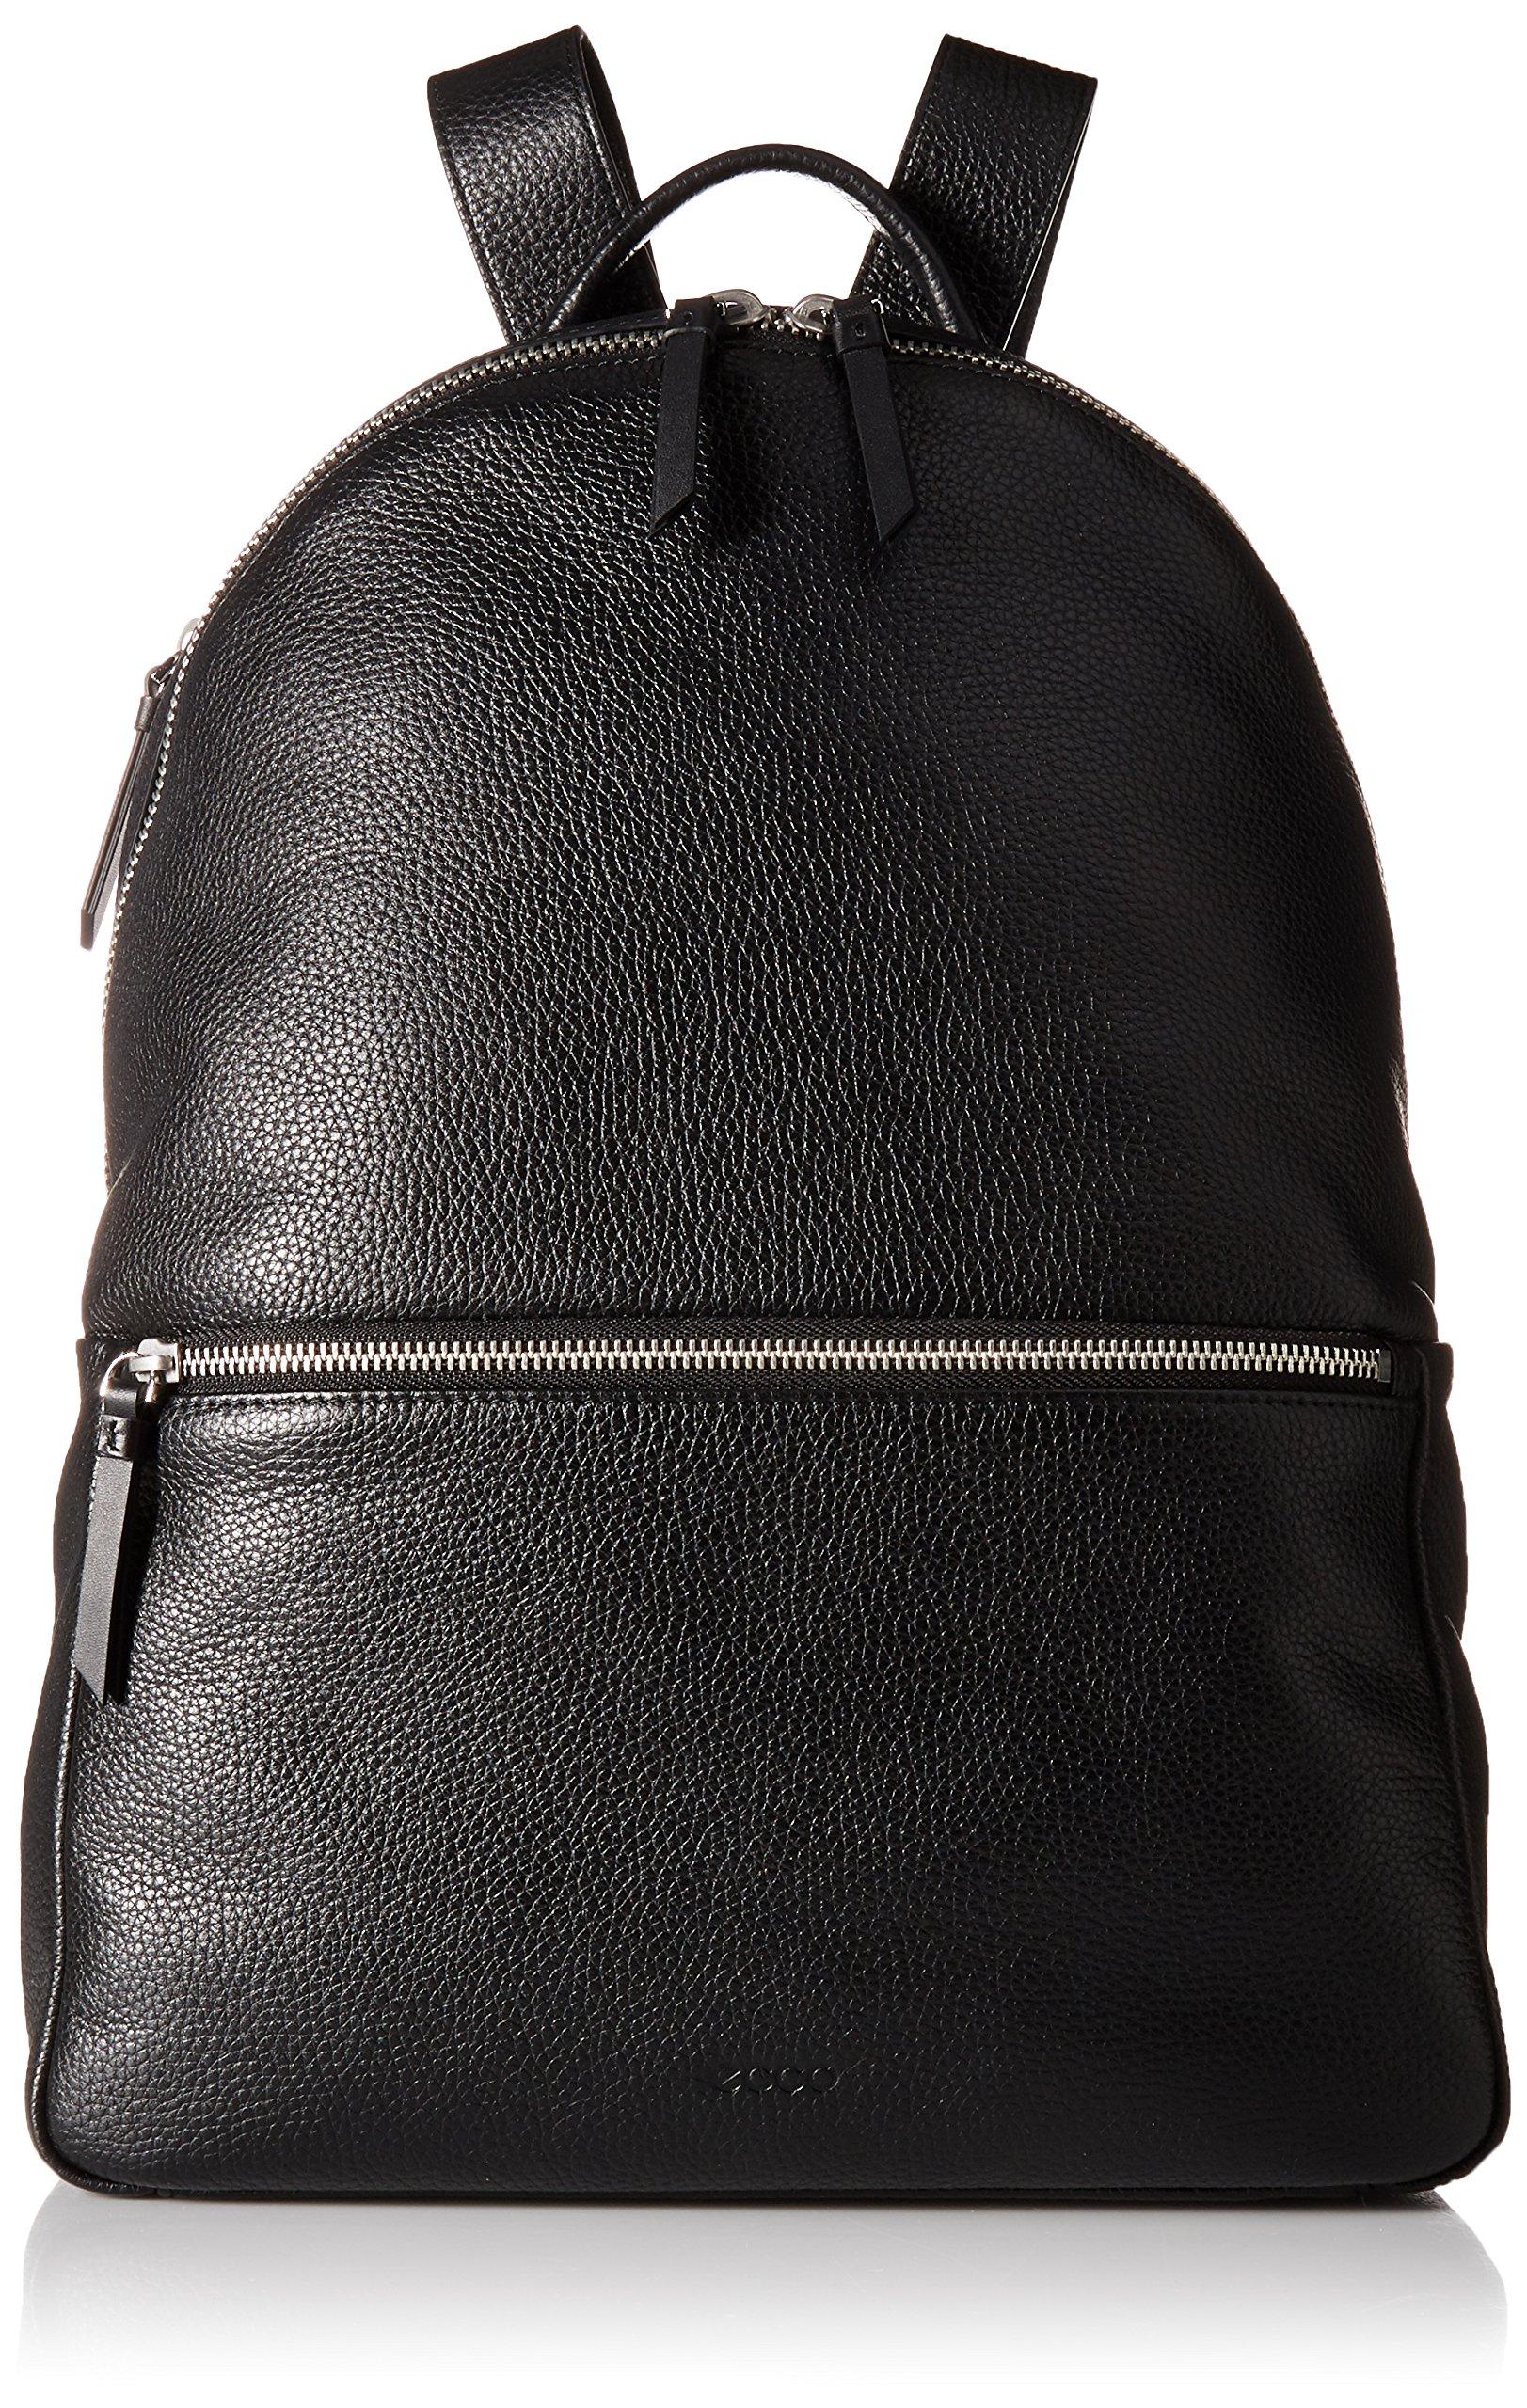 SP 3 Backpack 13 inch Backpack, Black, One Size